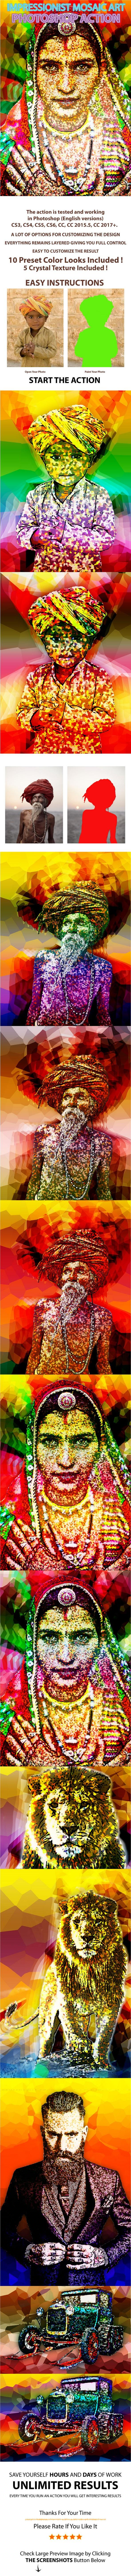 GraphicRiver Impressionist Mosaic Art Photoshop Action 20803726